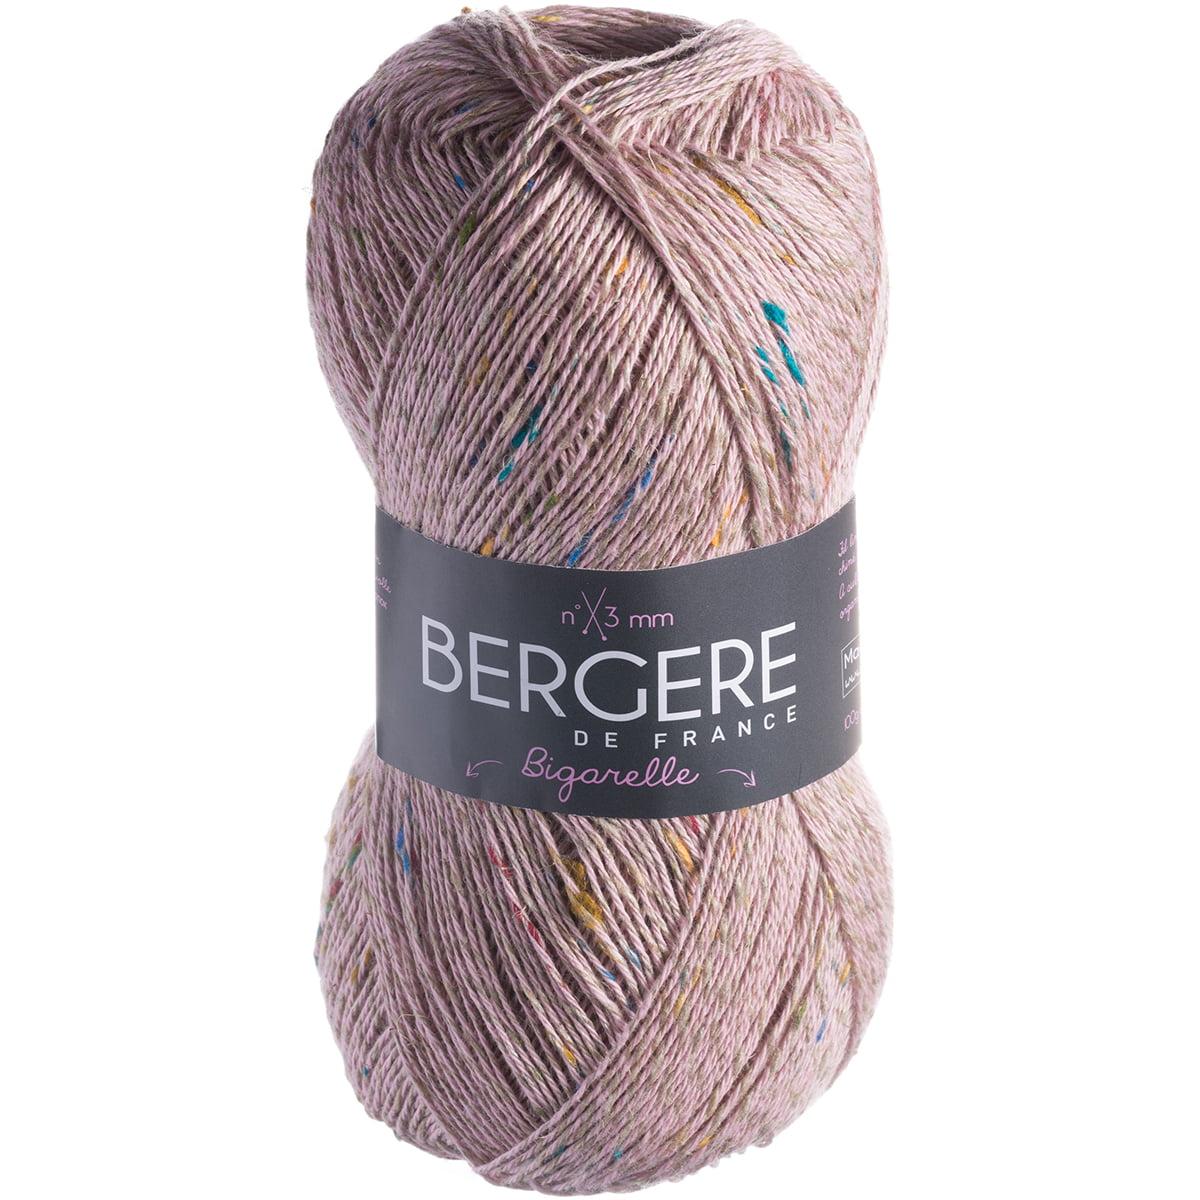 Bergere De France Bigarelle Yarn-Roseraie